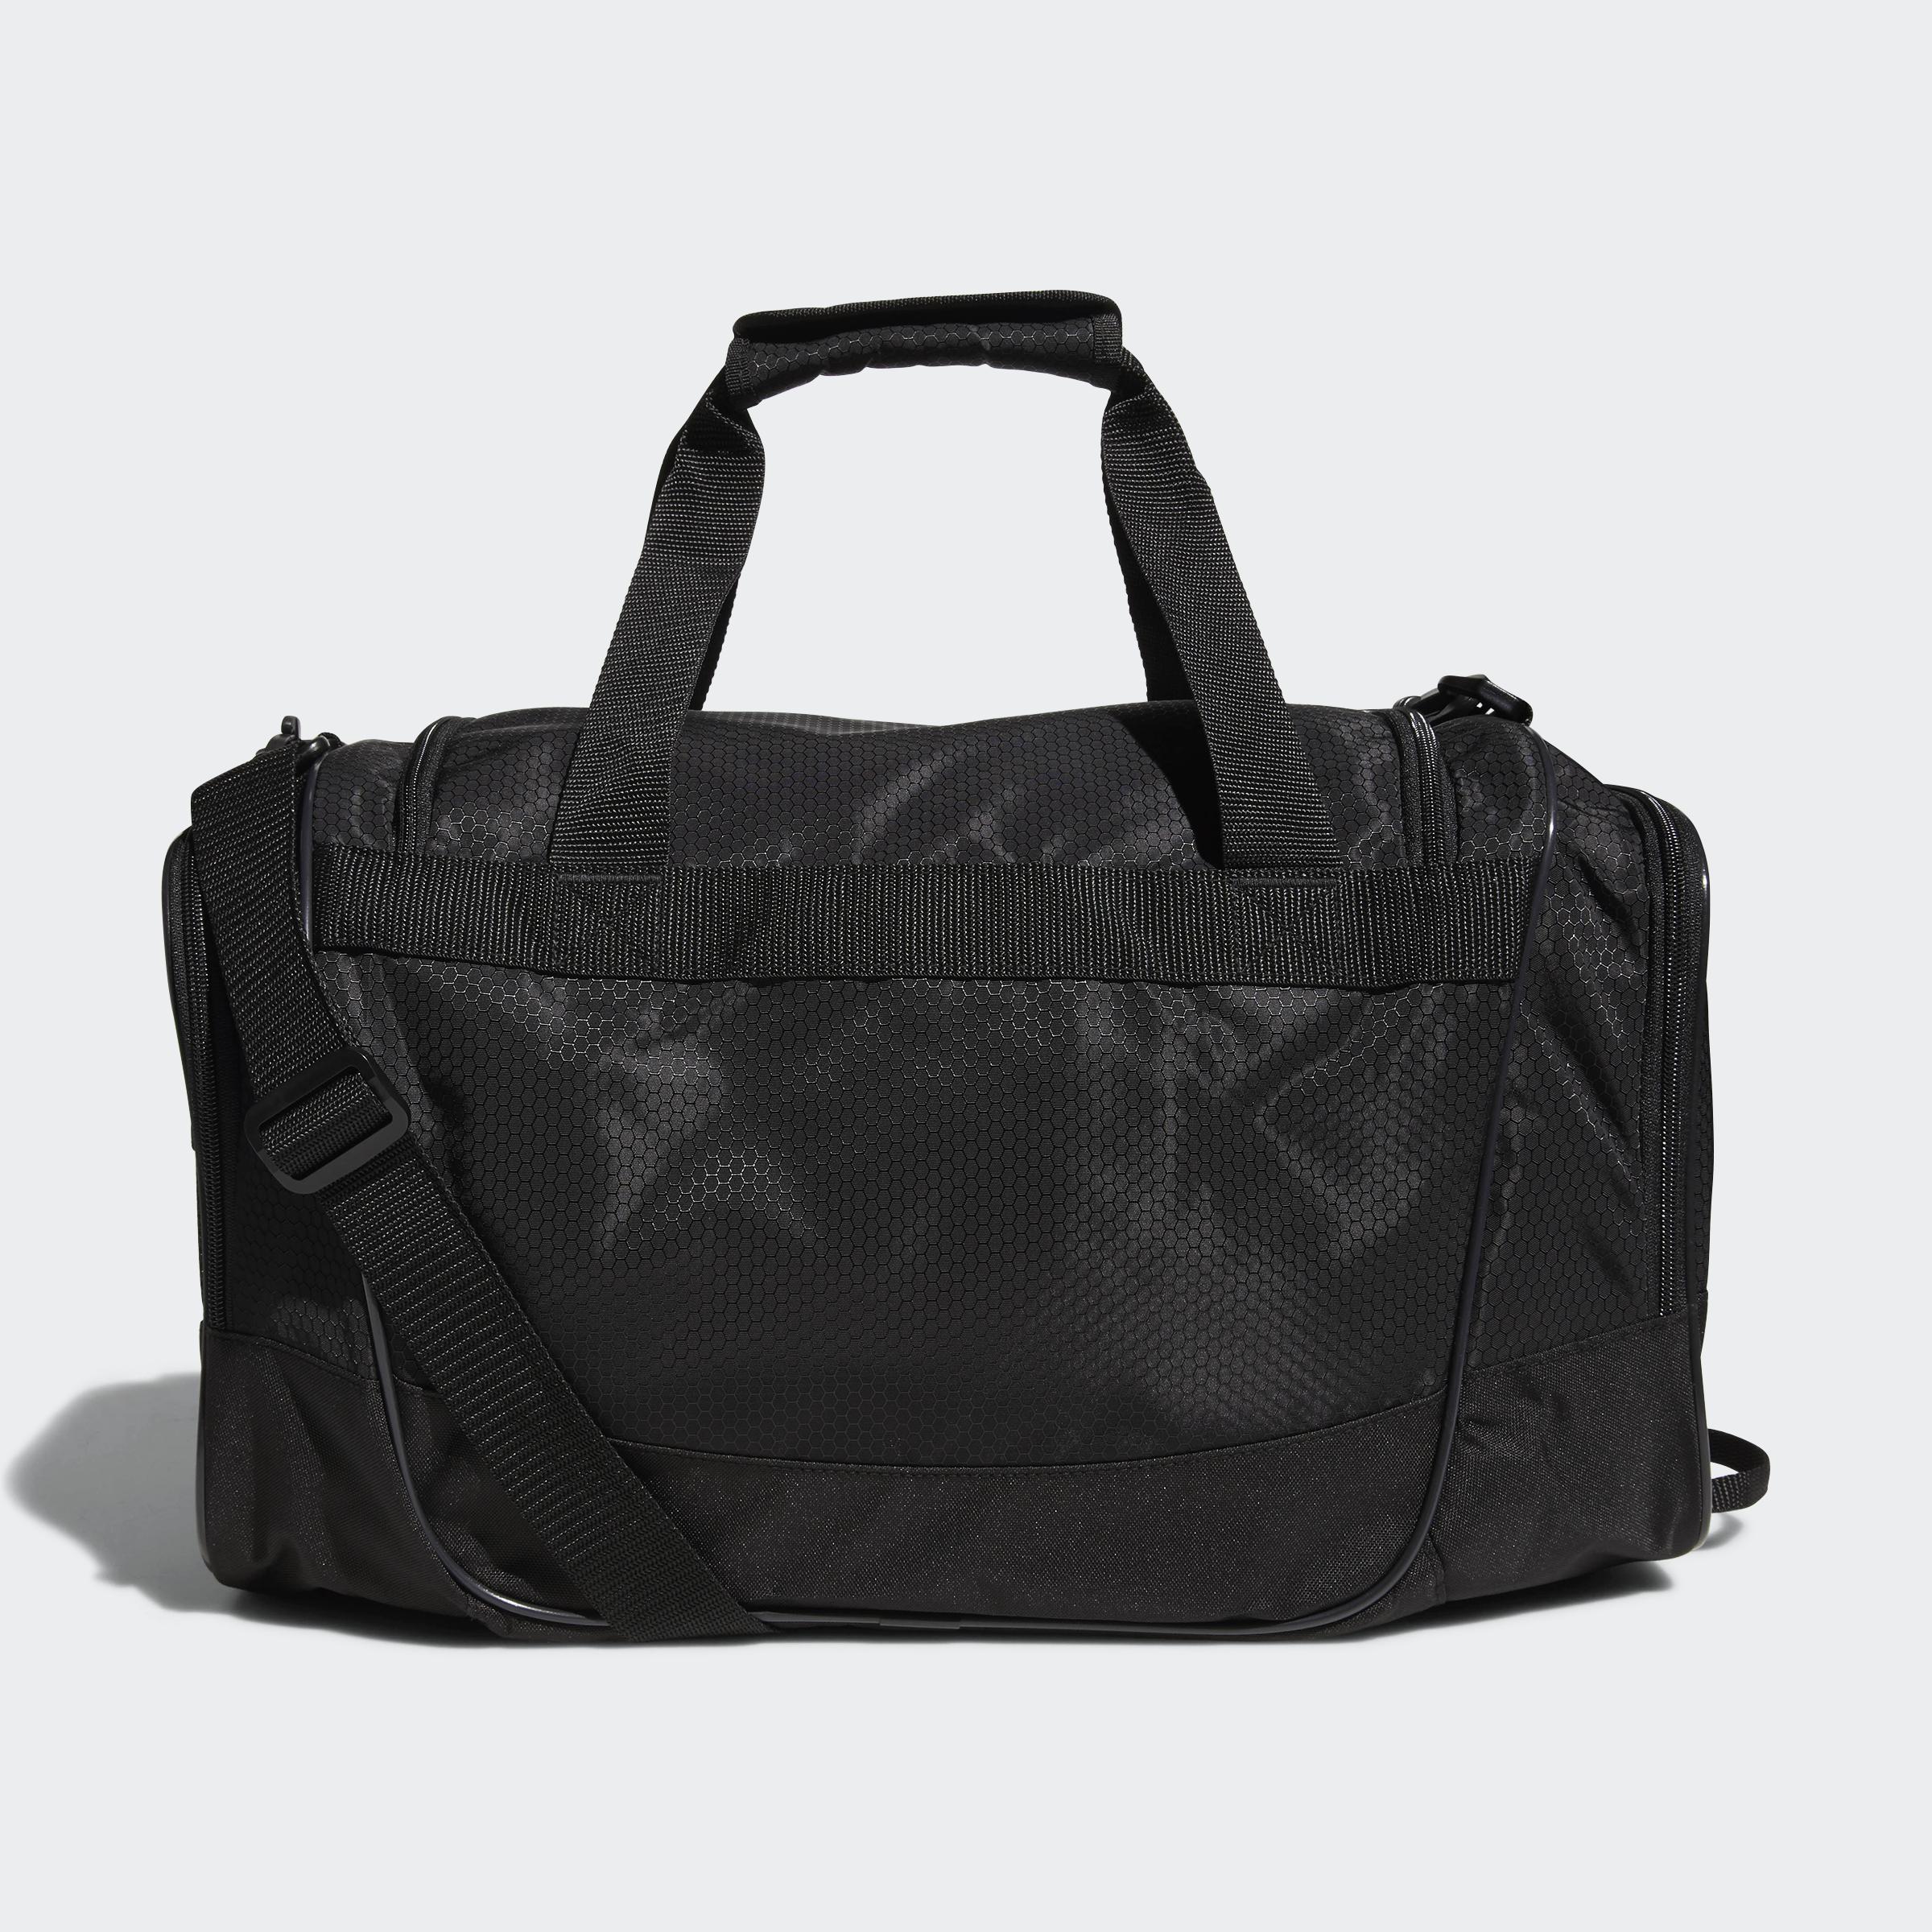 miniature 4 - adidas Defender III Small Duffel  Bags